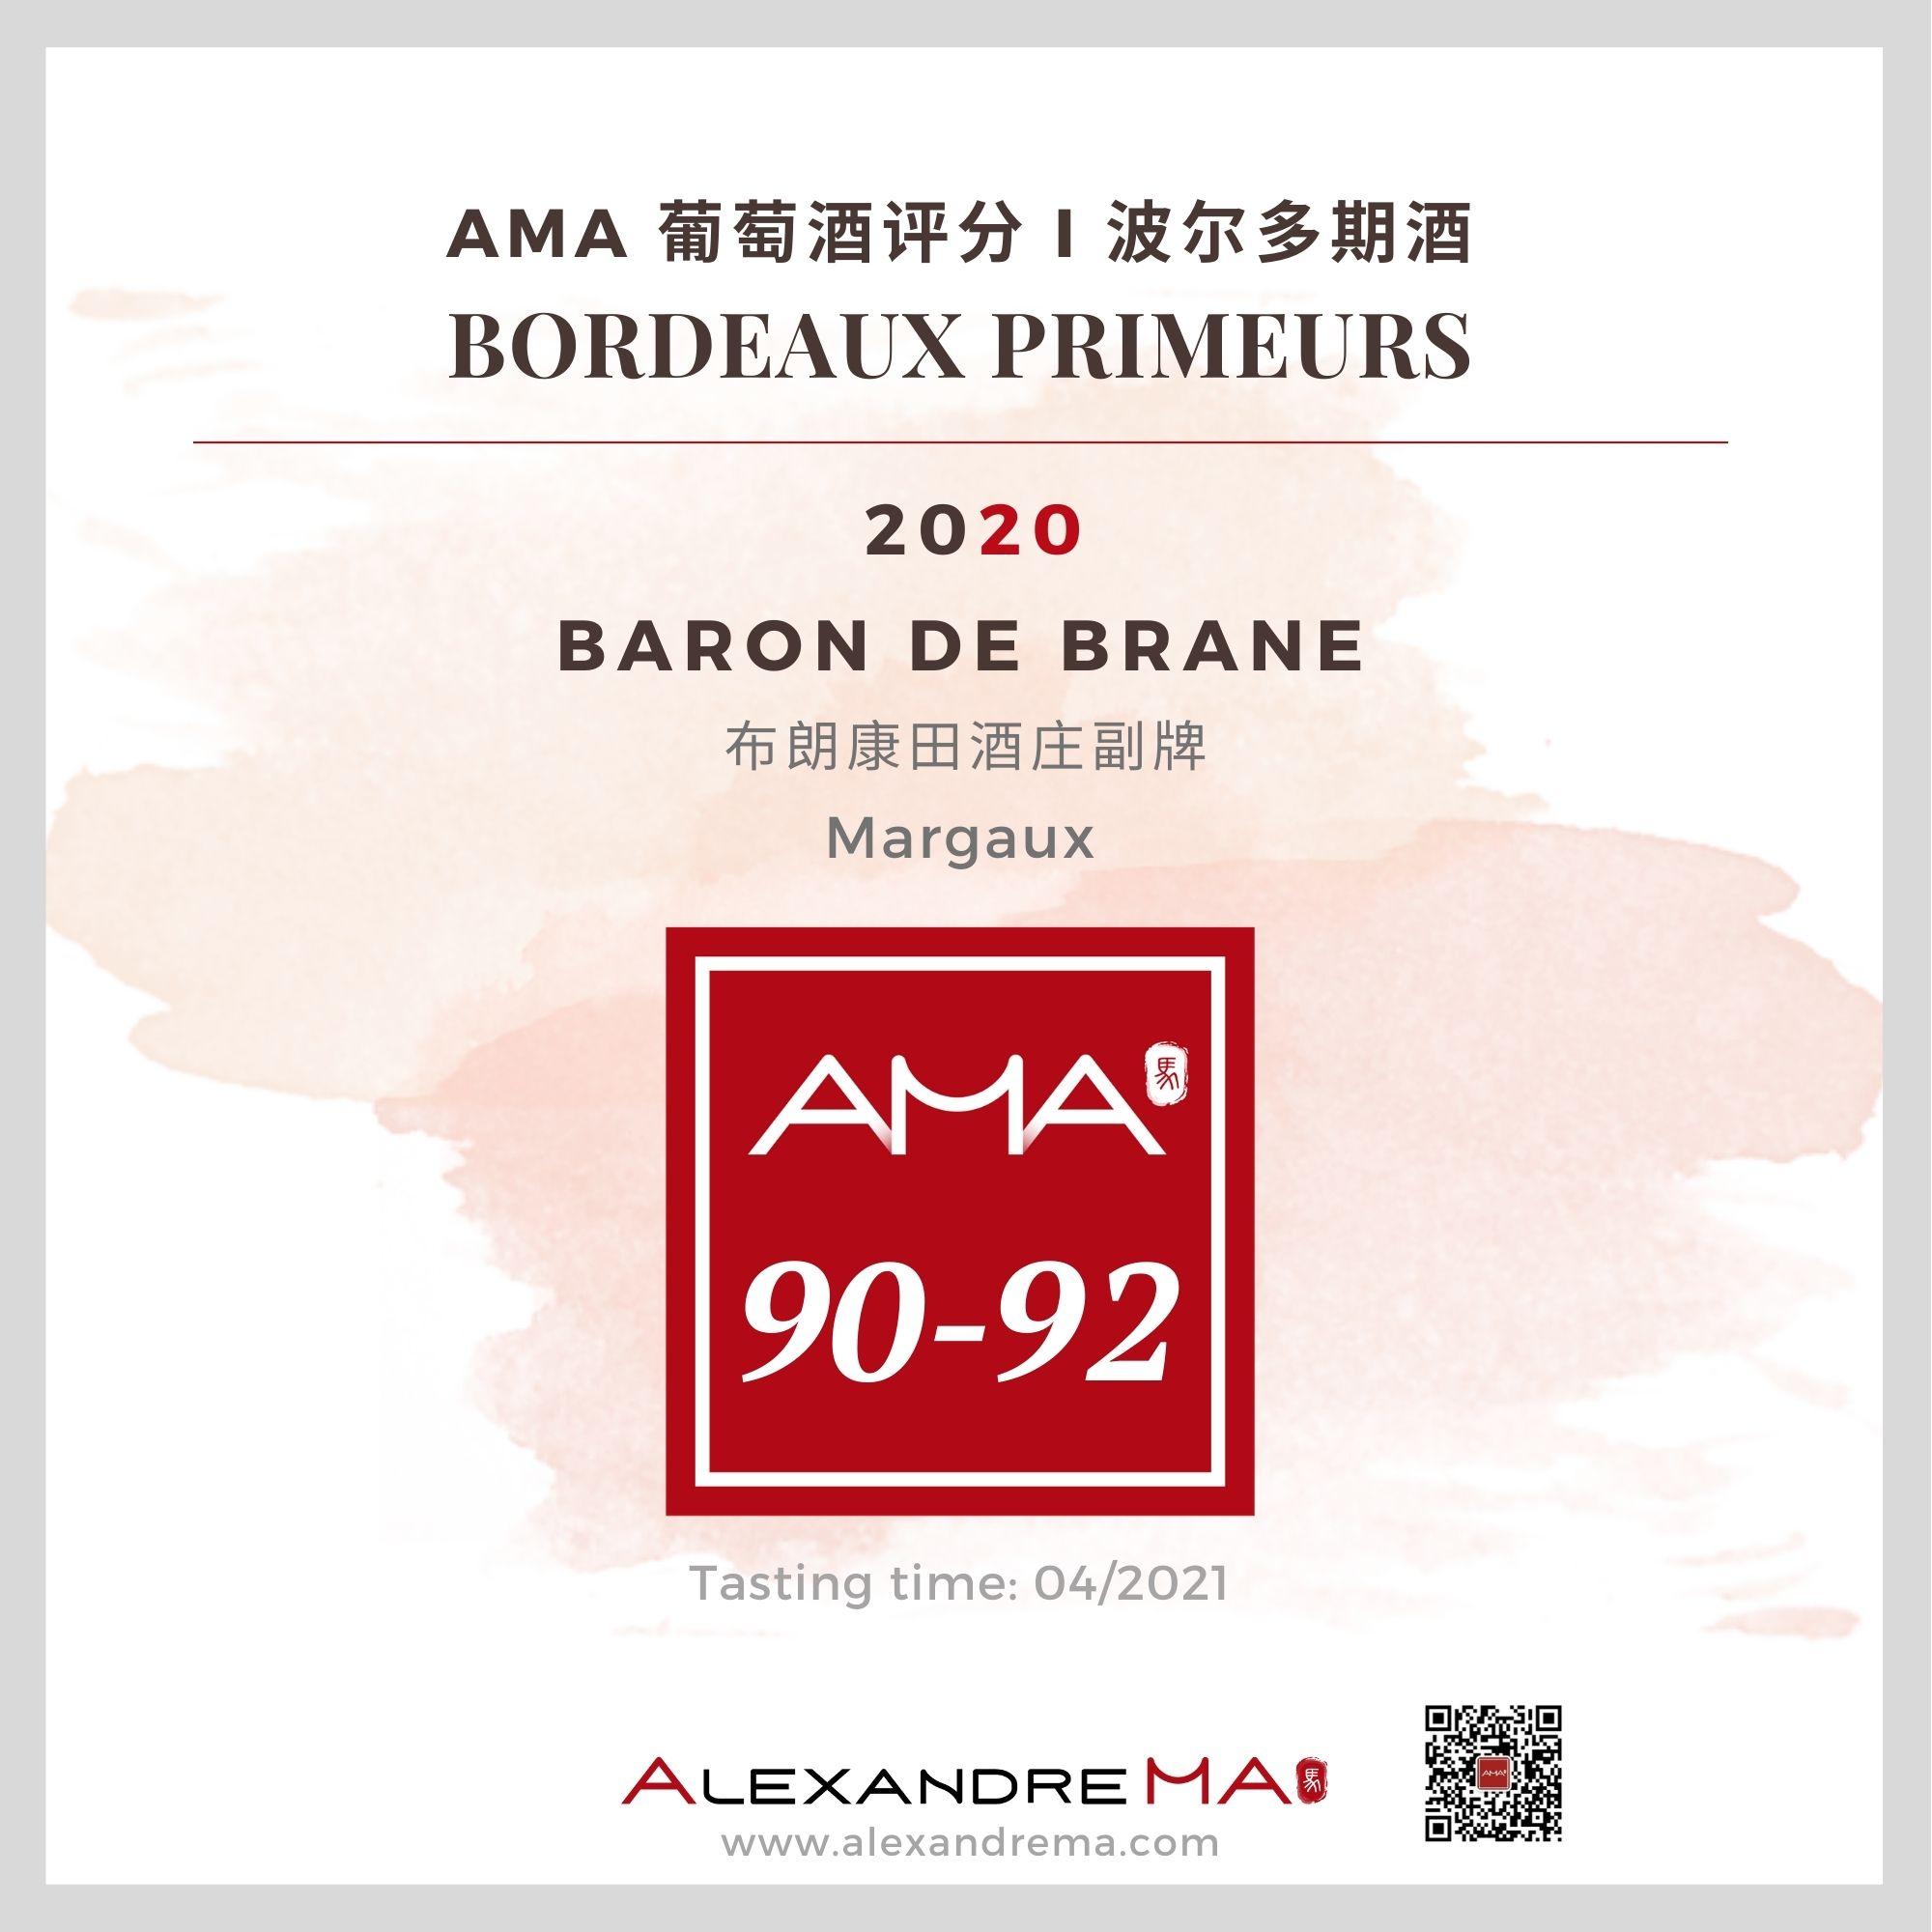 Baron de Brane 2020 布朗男爵 - Alexandre Ma